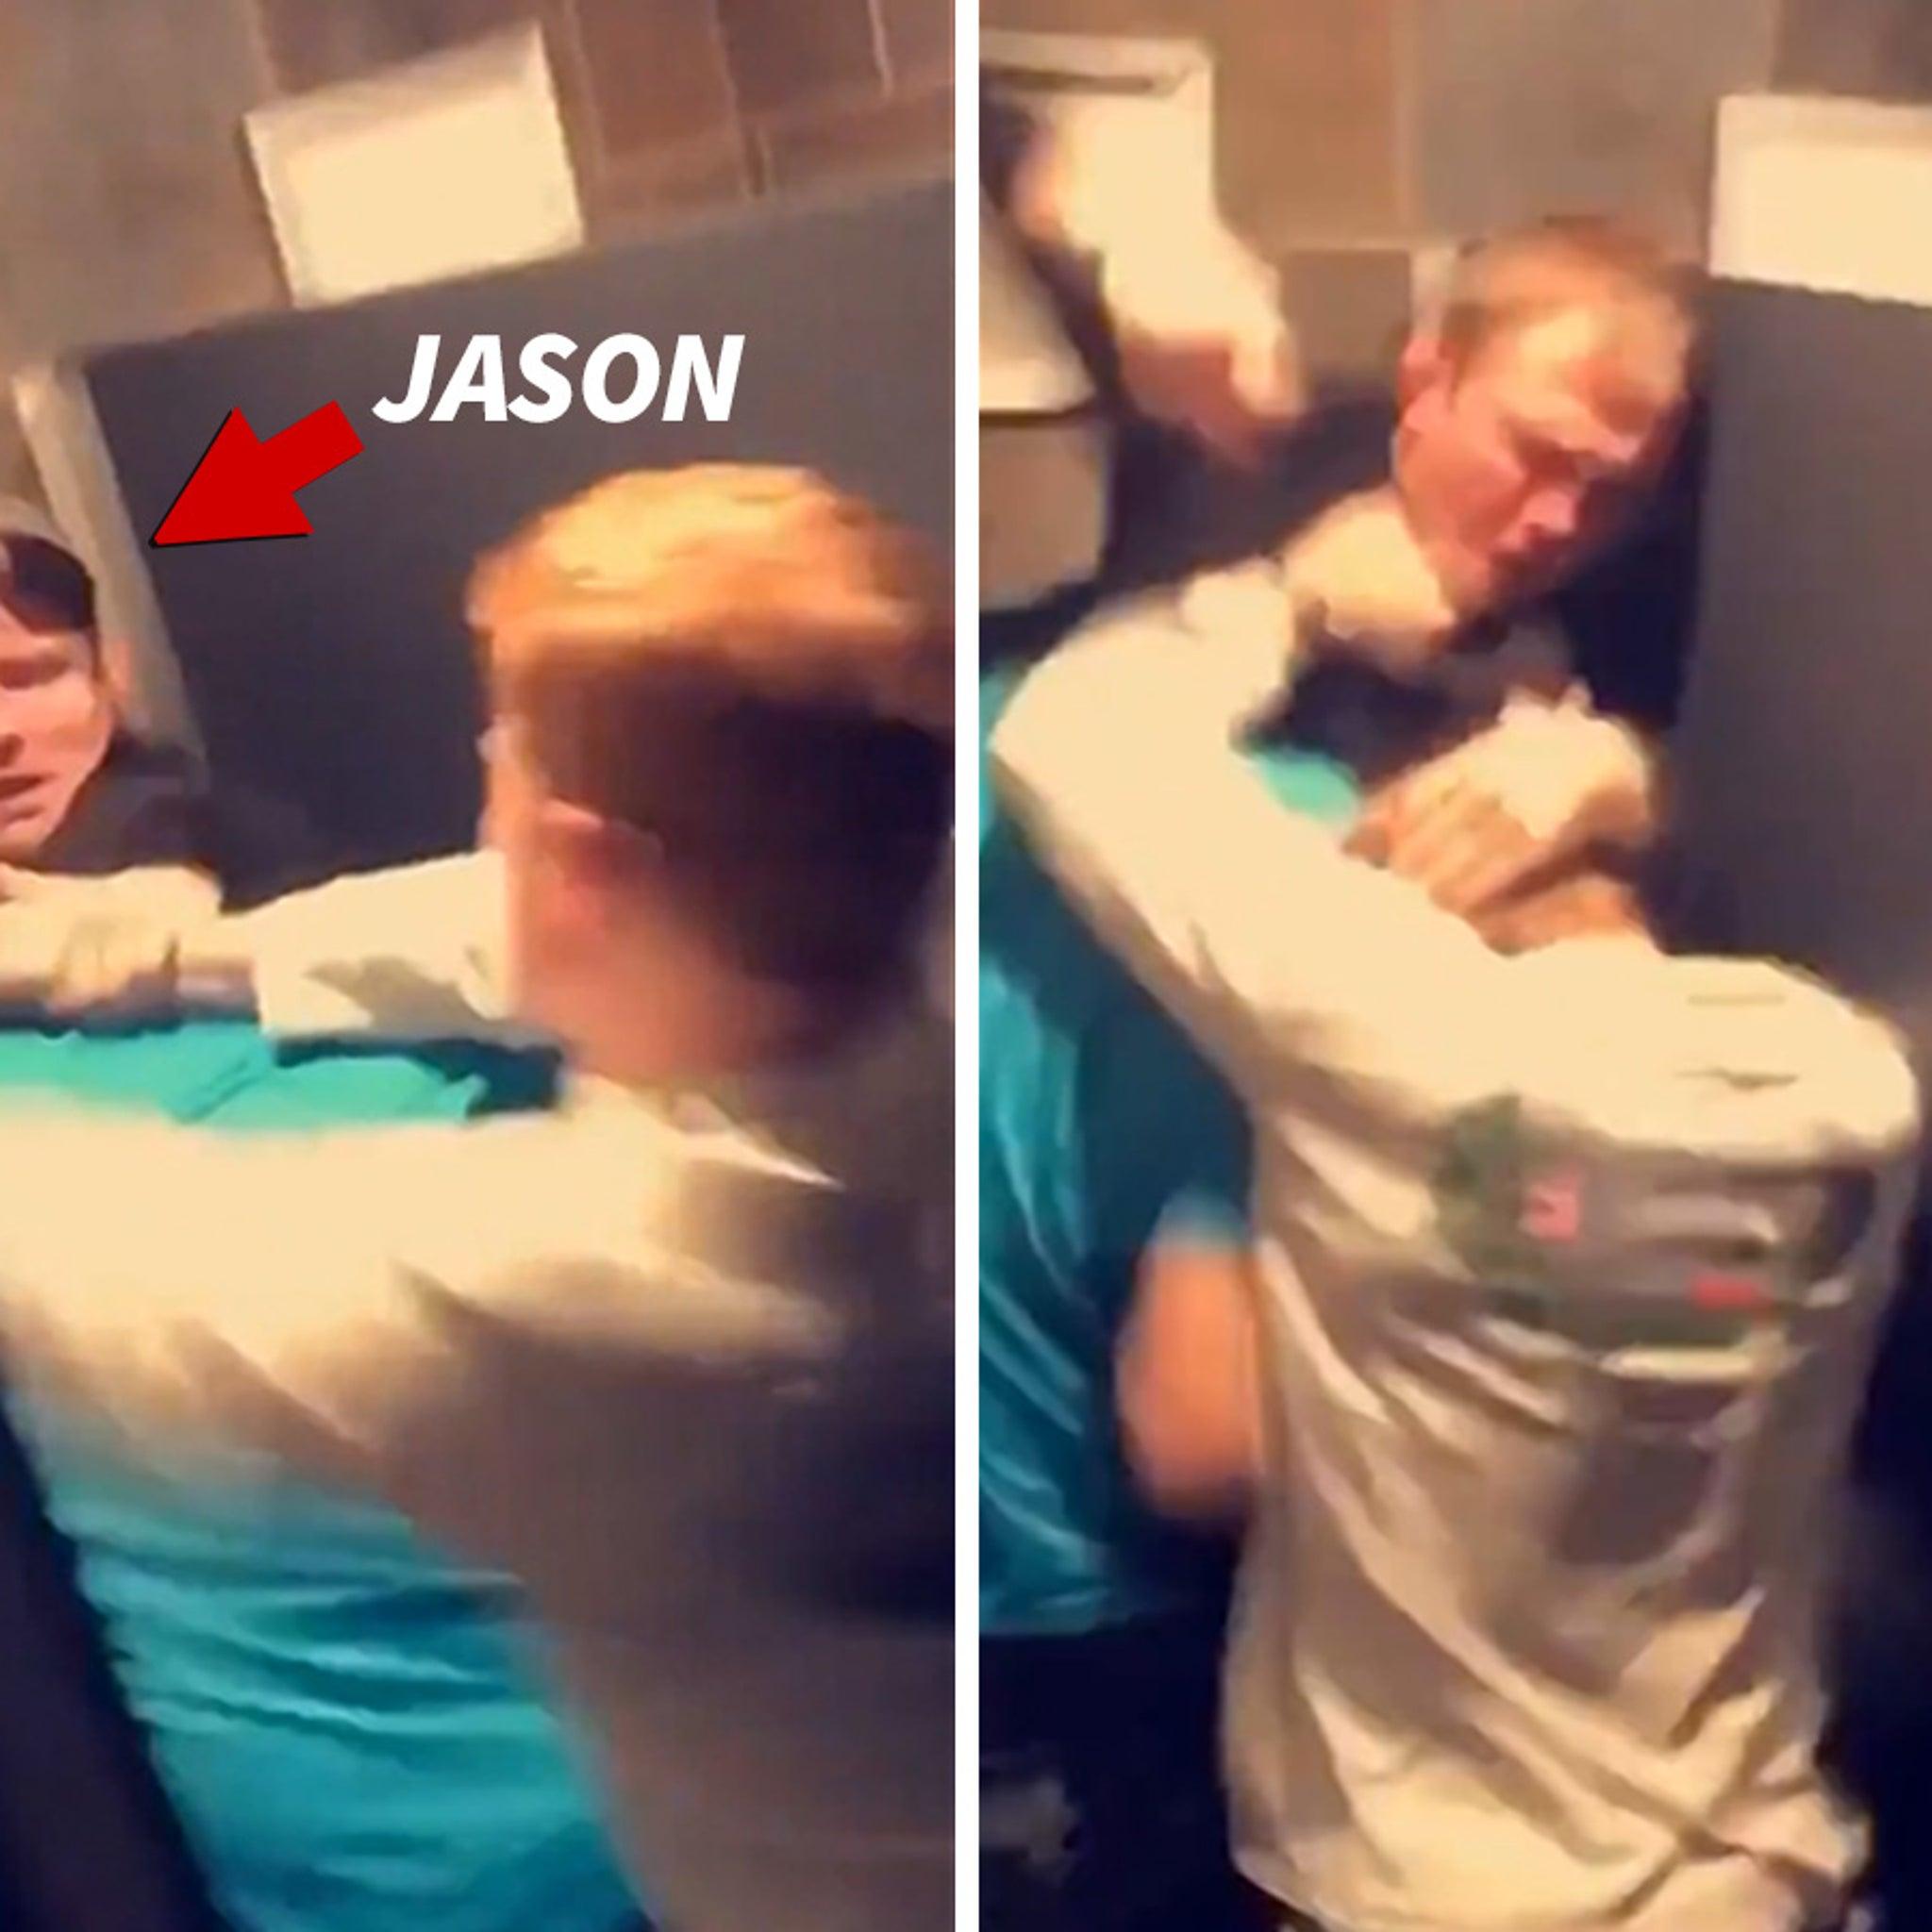 MMA's Jason Knight Explains Insane Bathroom Fight Video, Here's What Happened